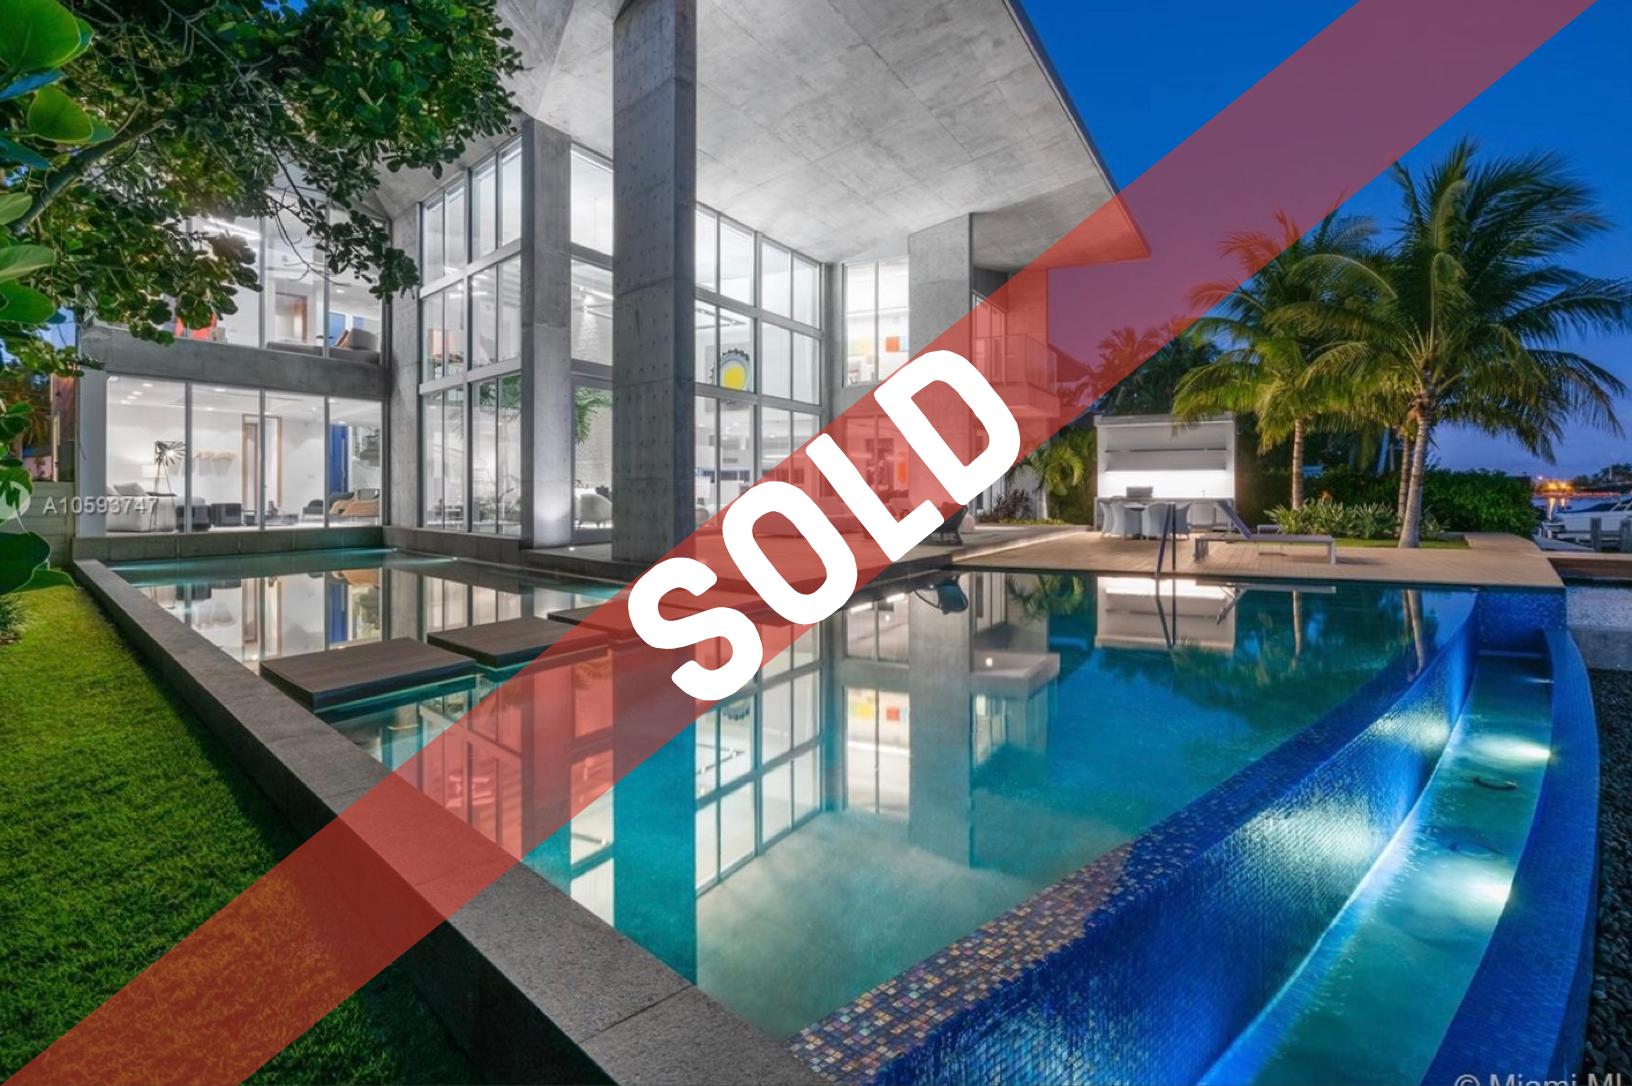 House 35 E Dilido Dr - Miami Beach, USA for sale For Super Rich